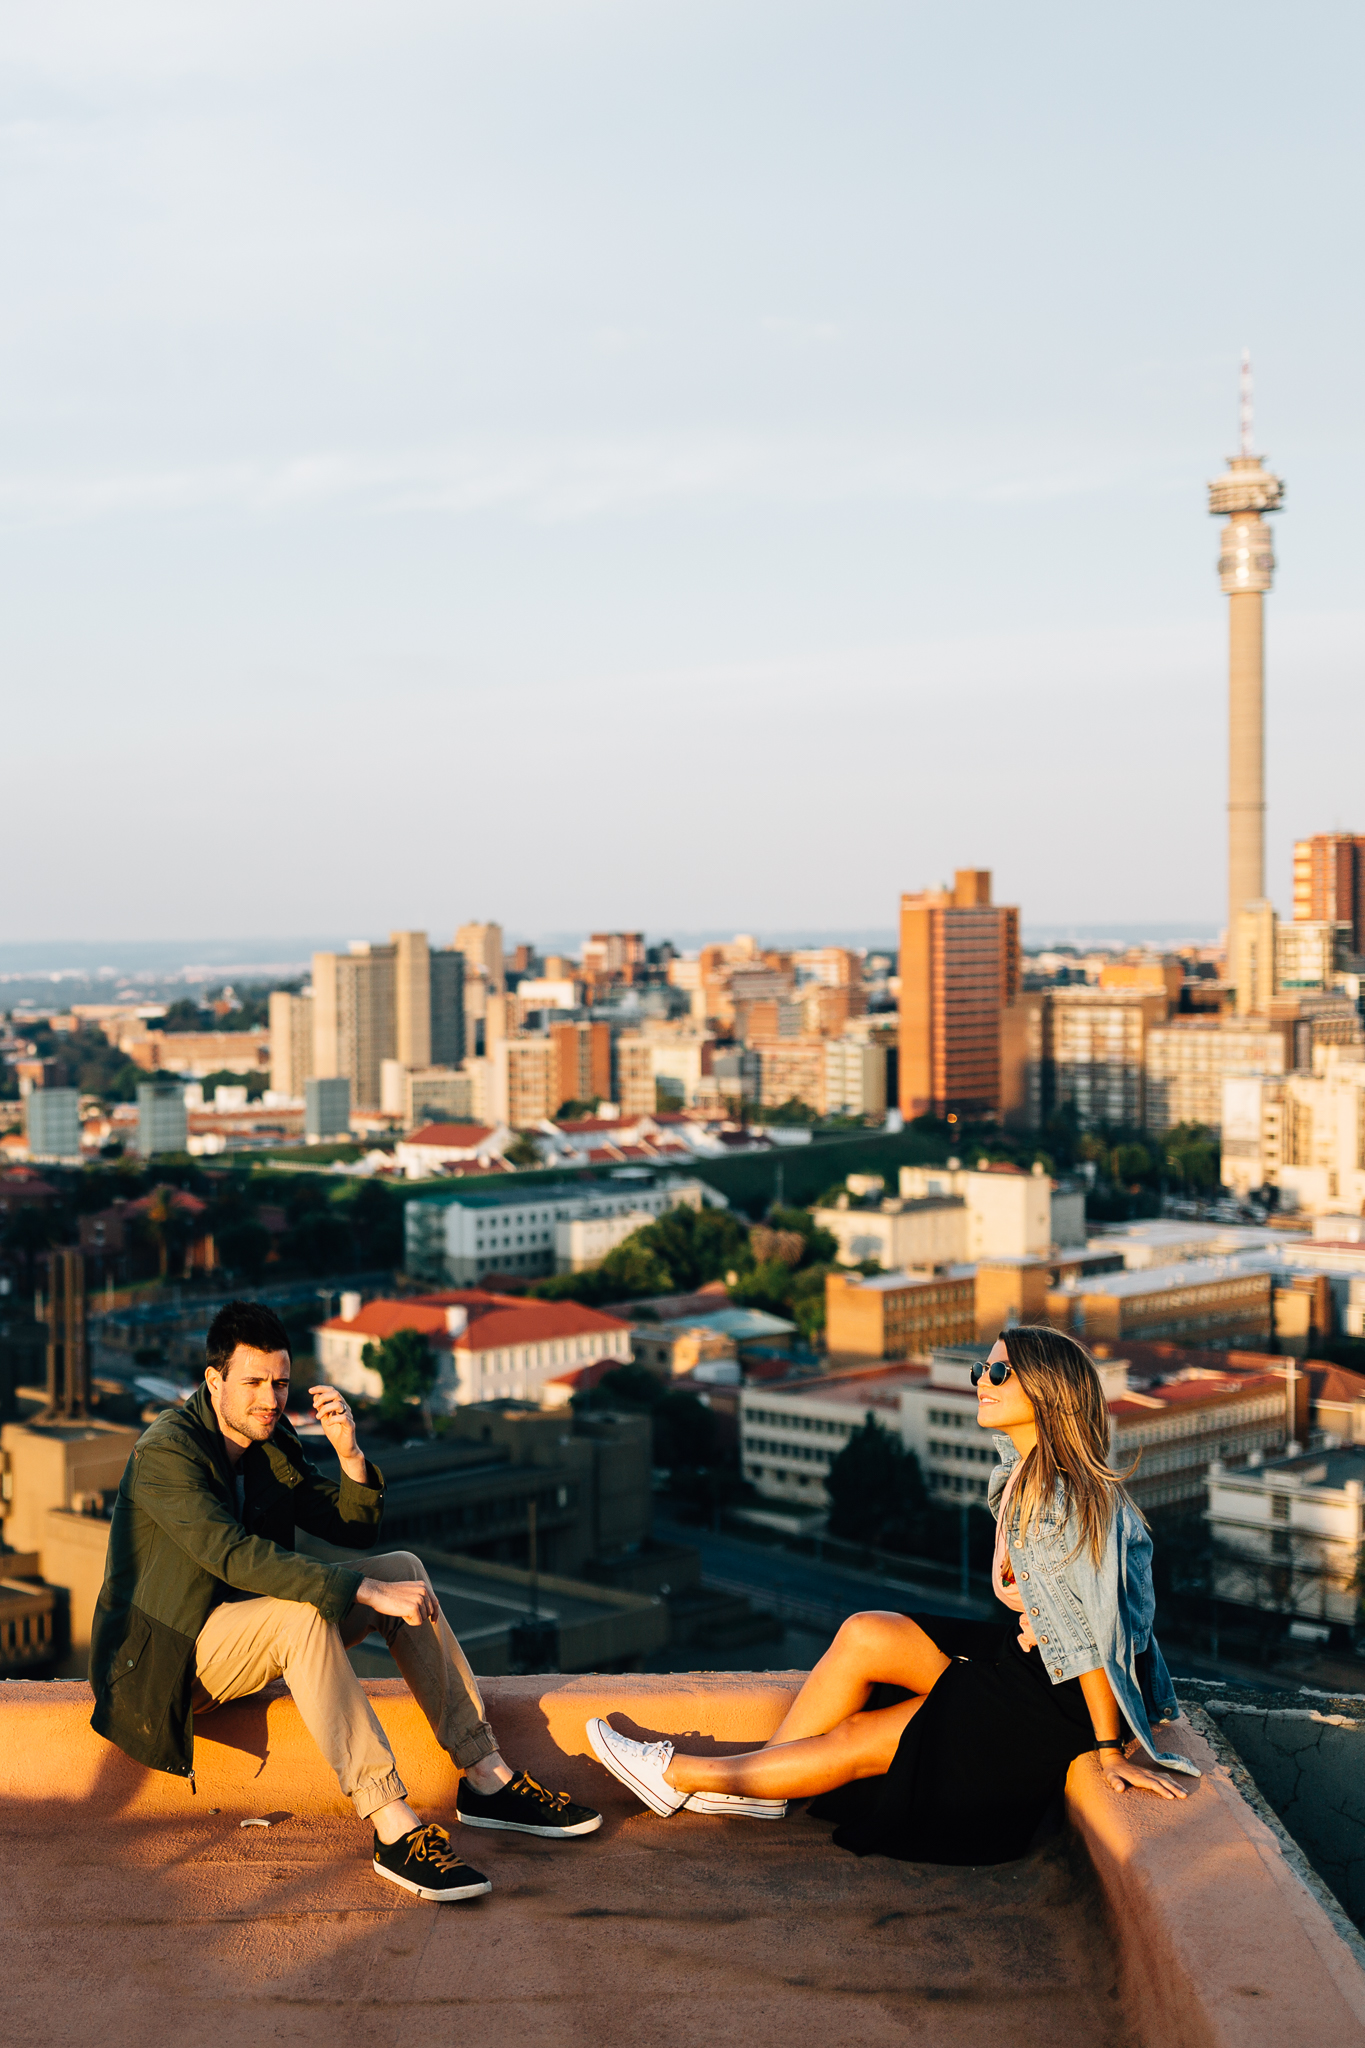 Melissa_Findley-SouthAfrica-Blog-96.jpg